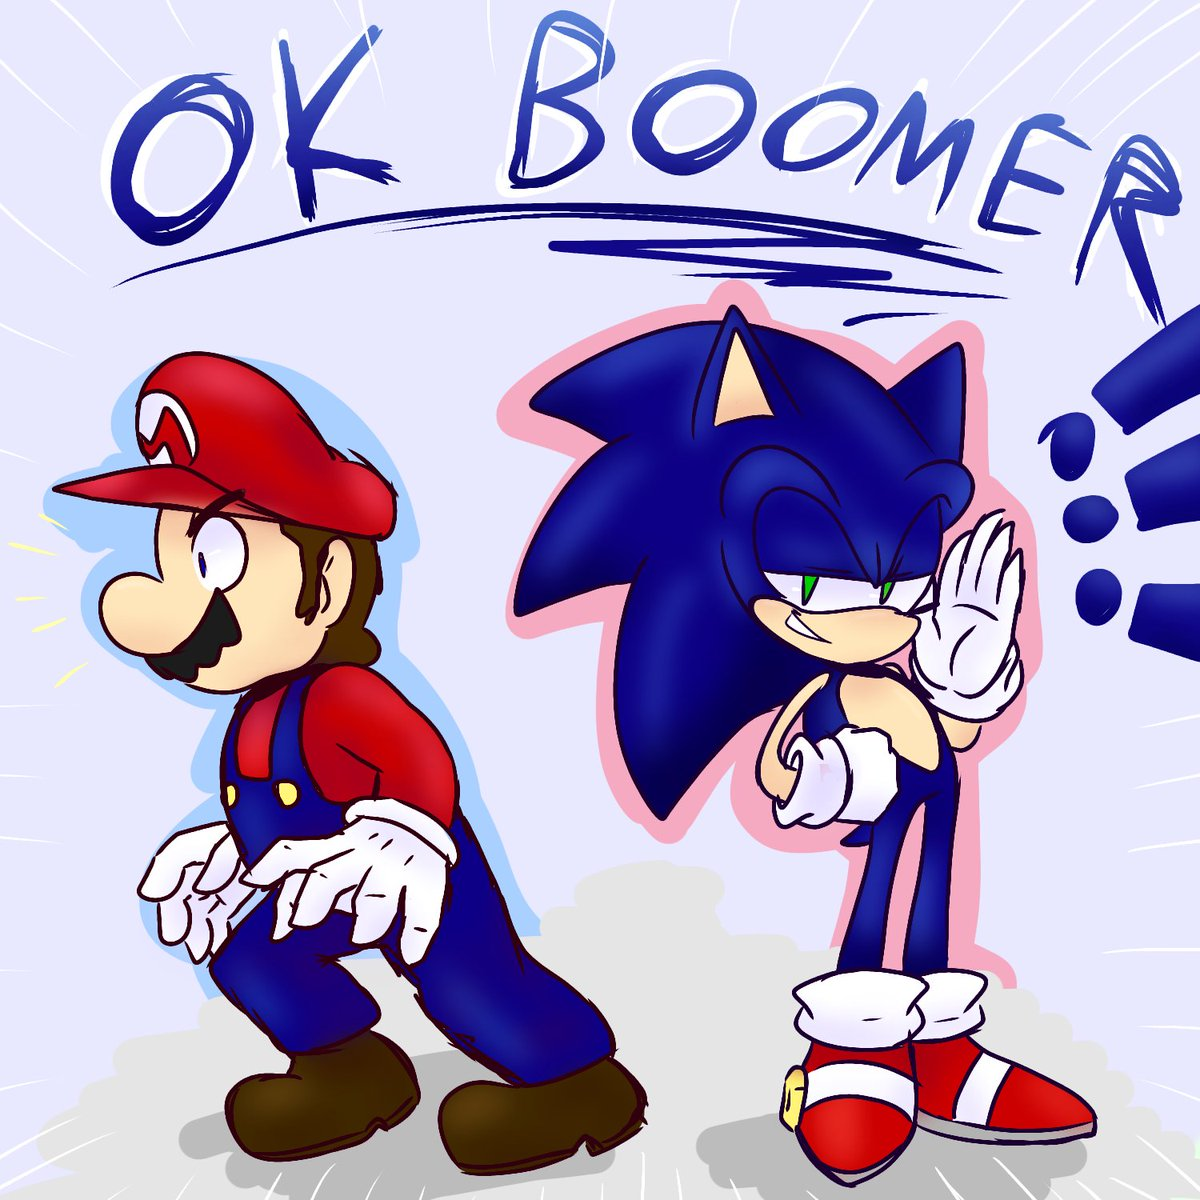 Mario and sonic lol#SuperMario #SonicTheHedgehog